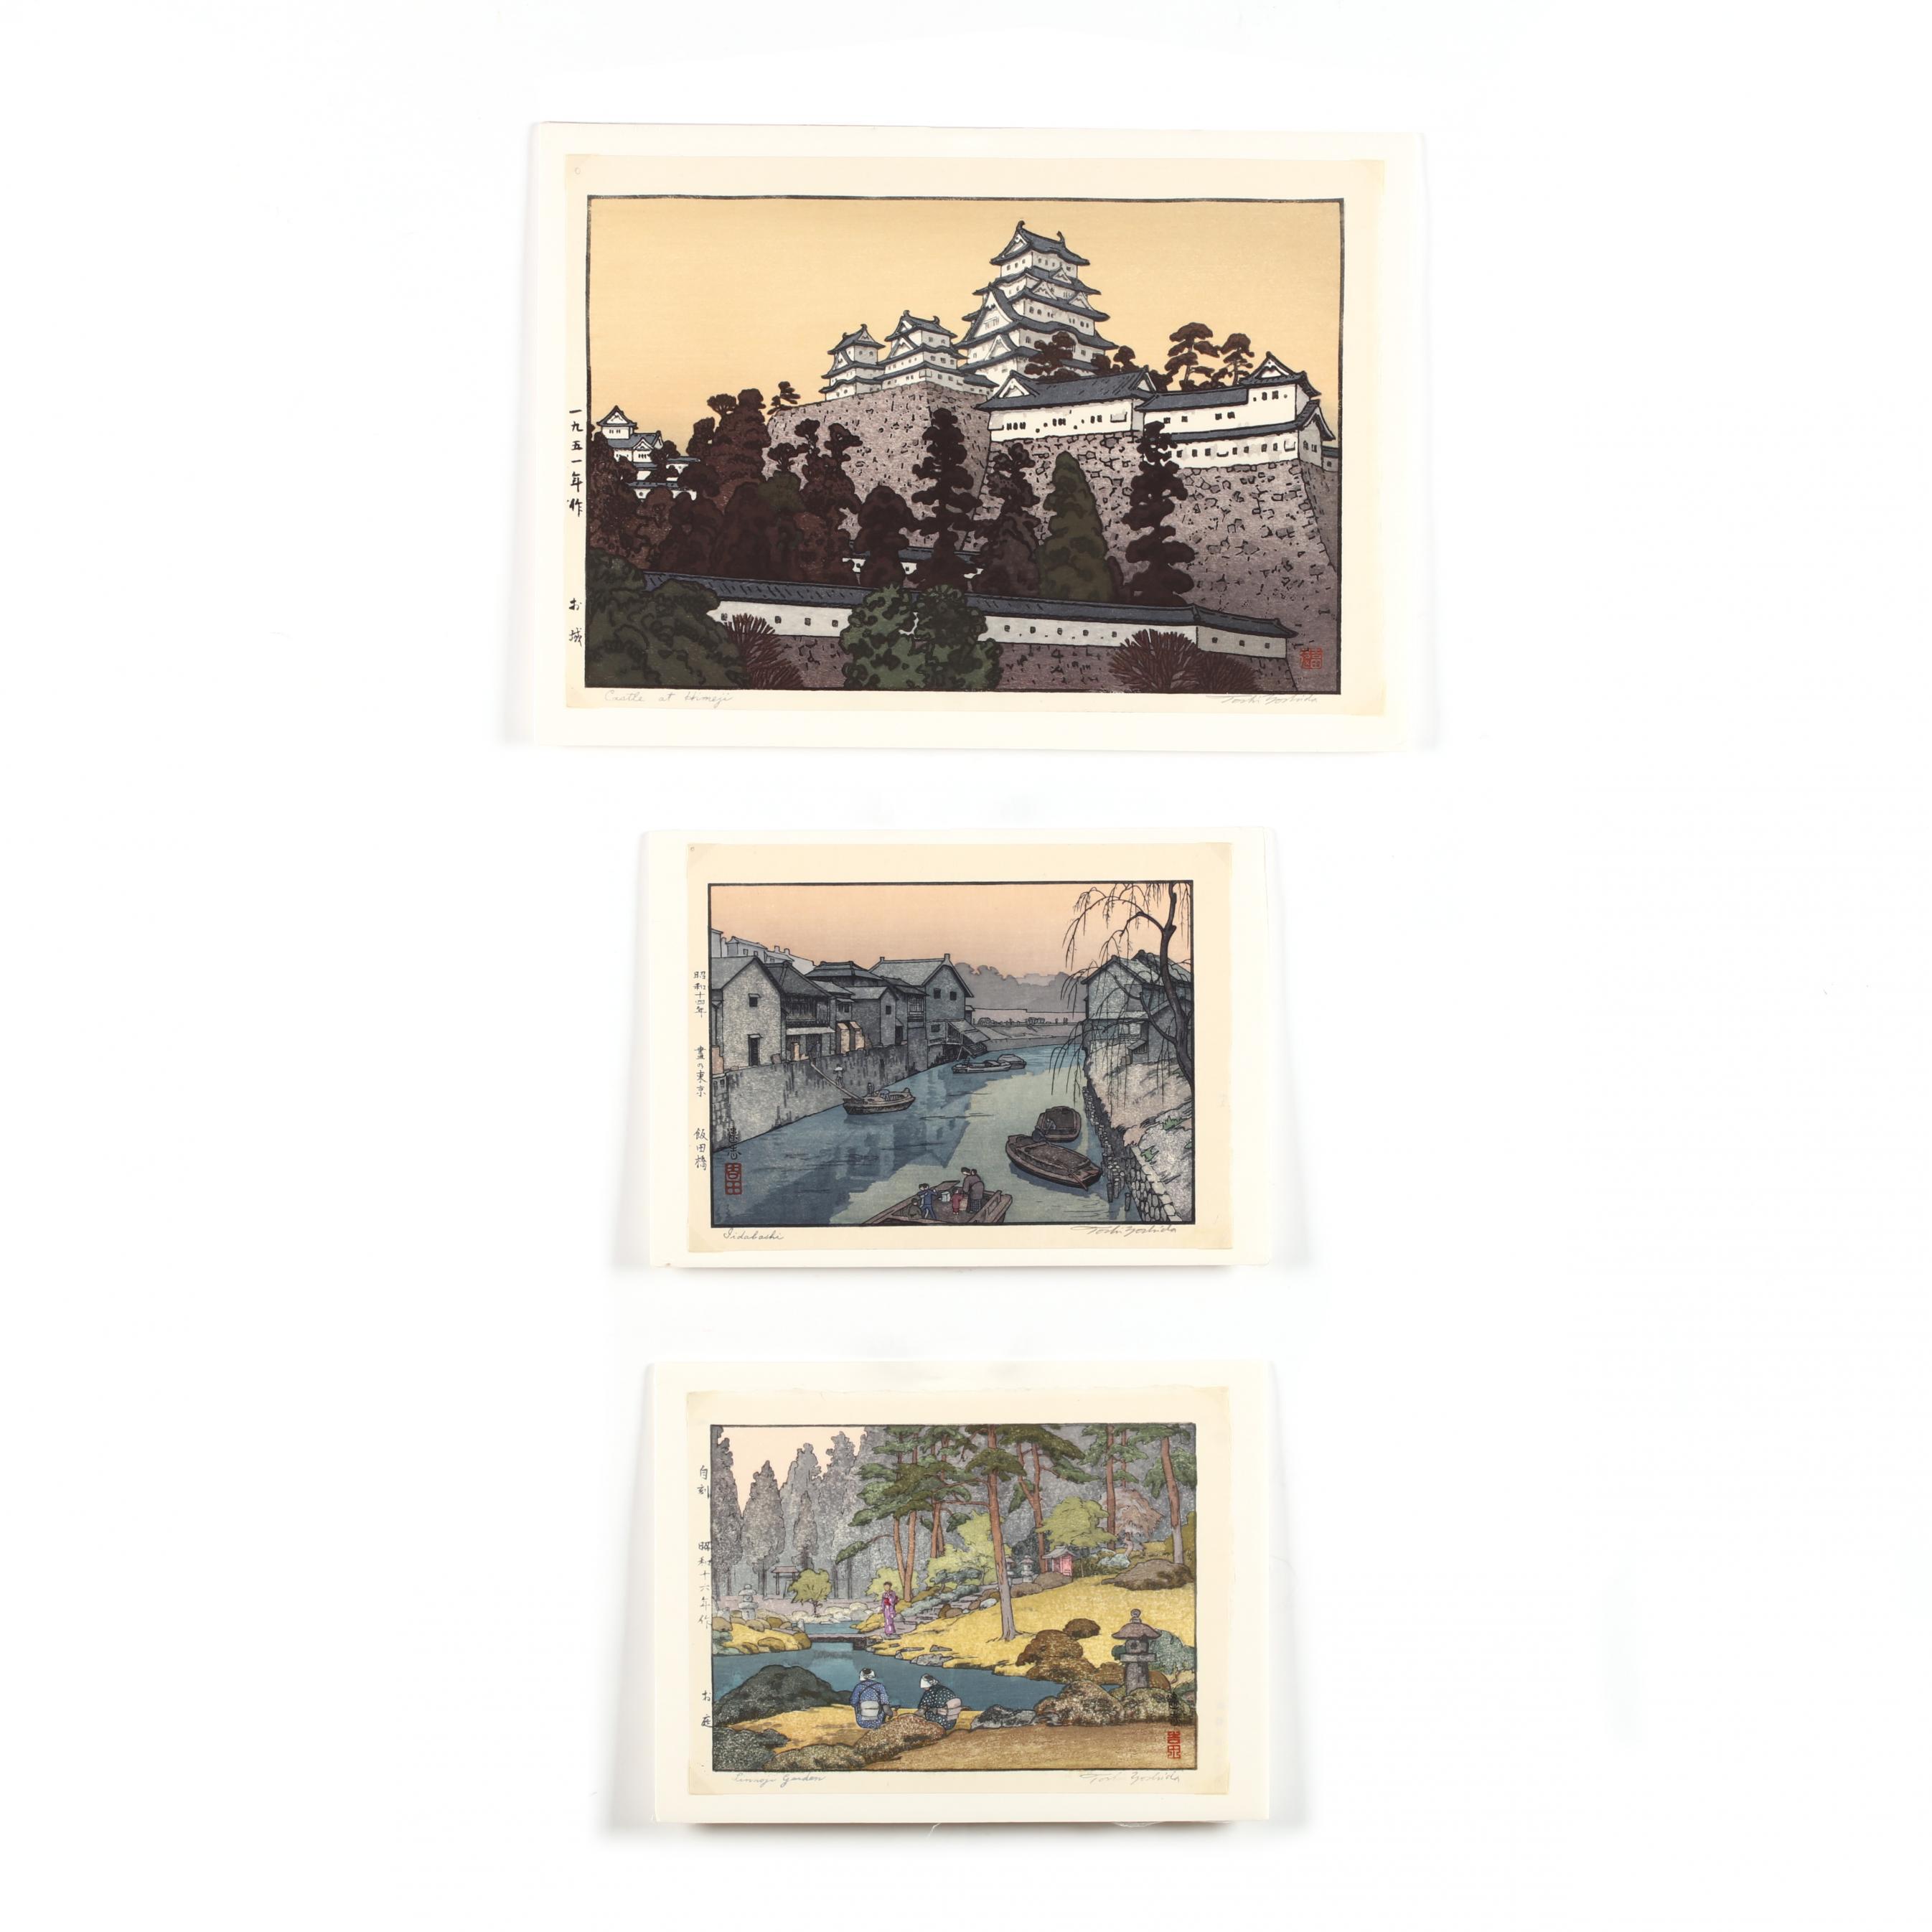 yoshida-toshi-japanese-1911-1995-three-woodblock-prints